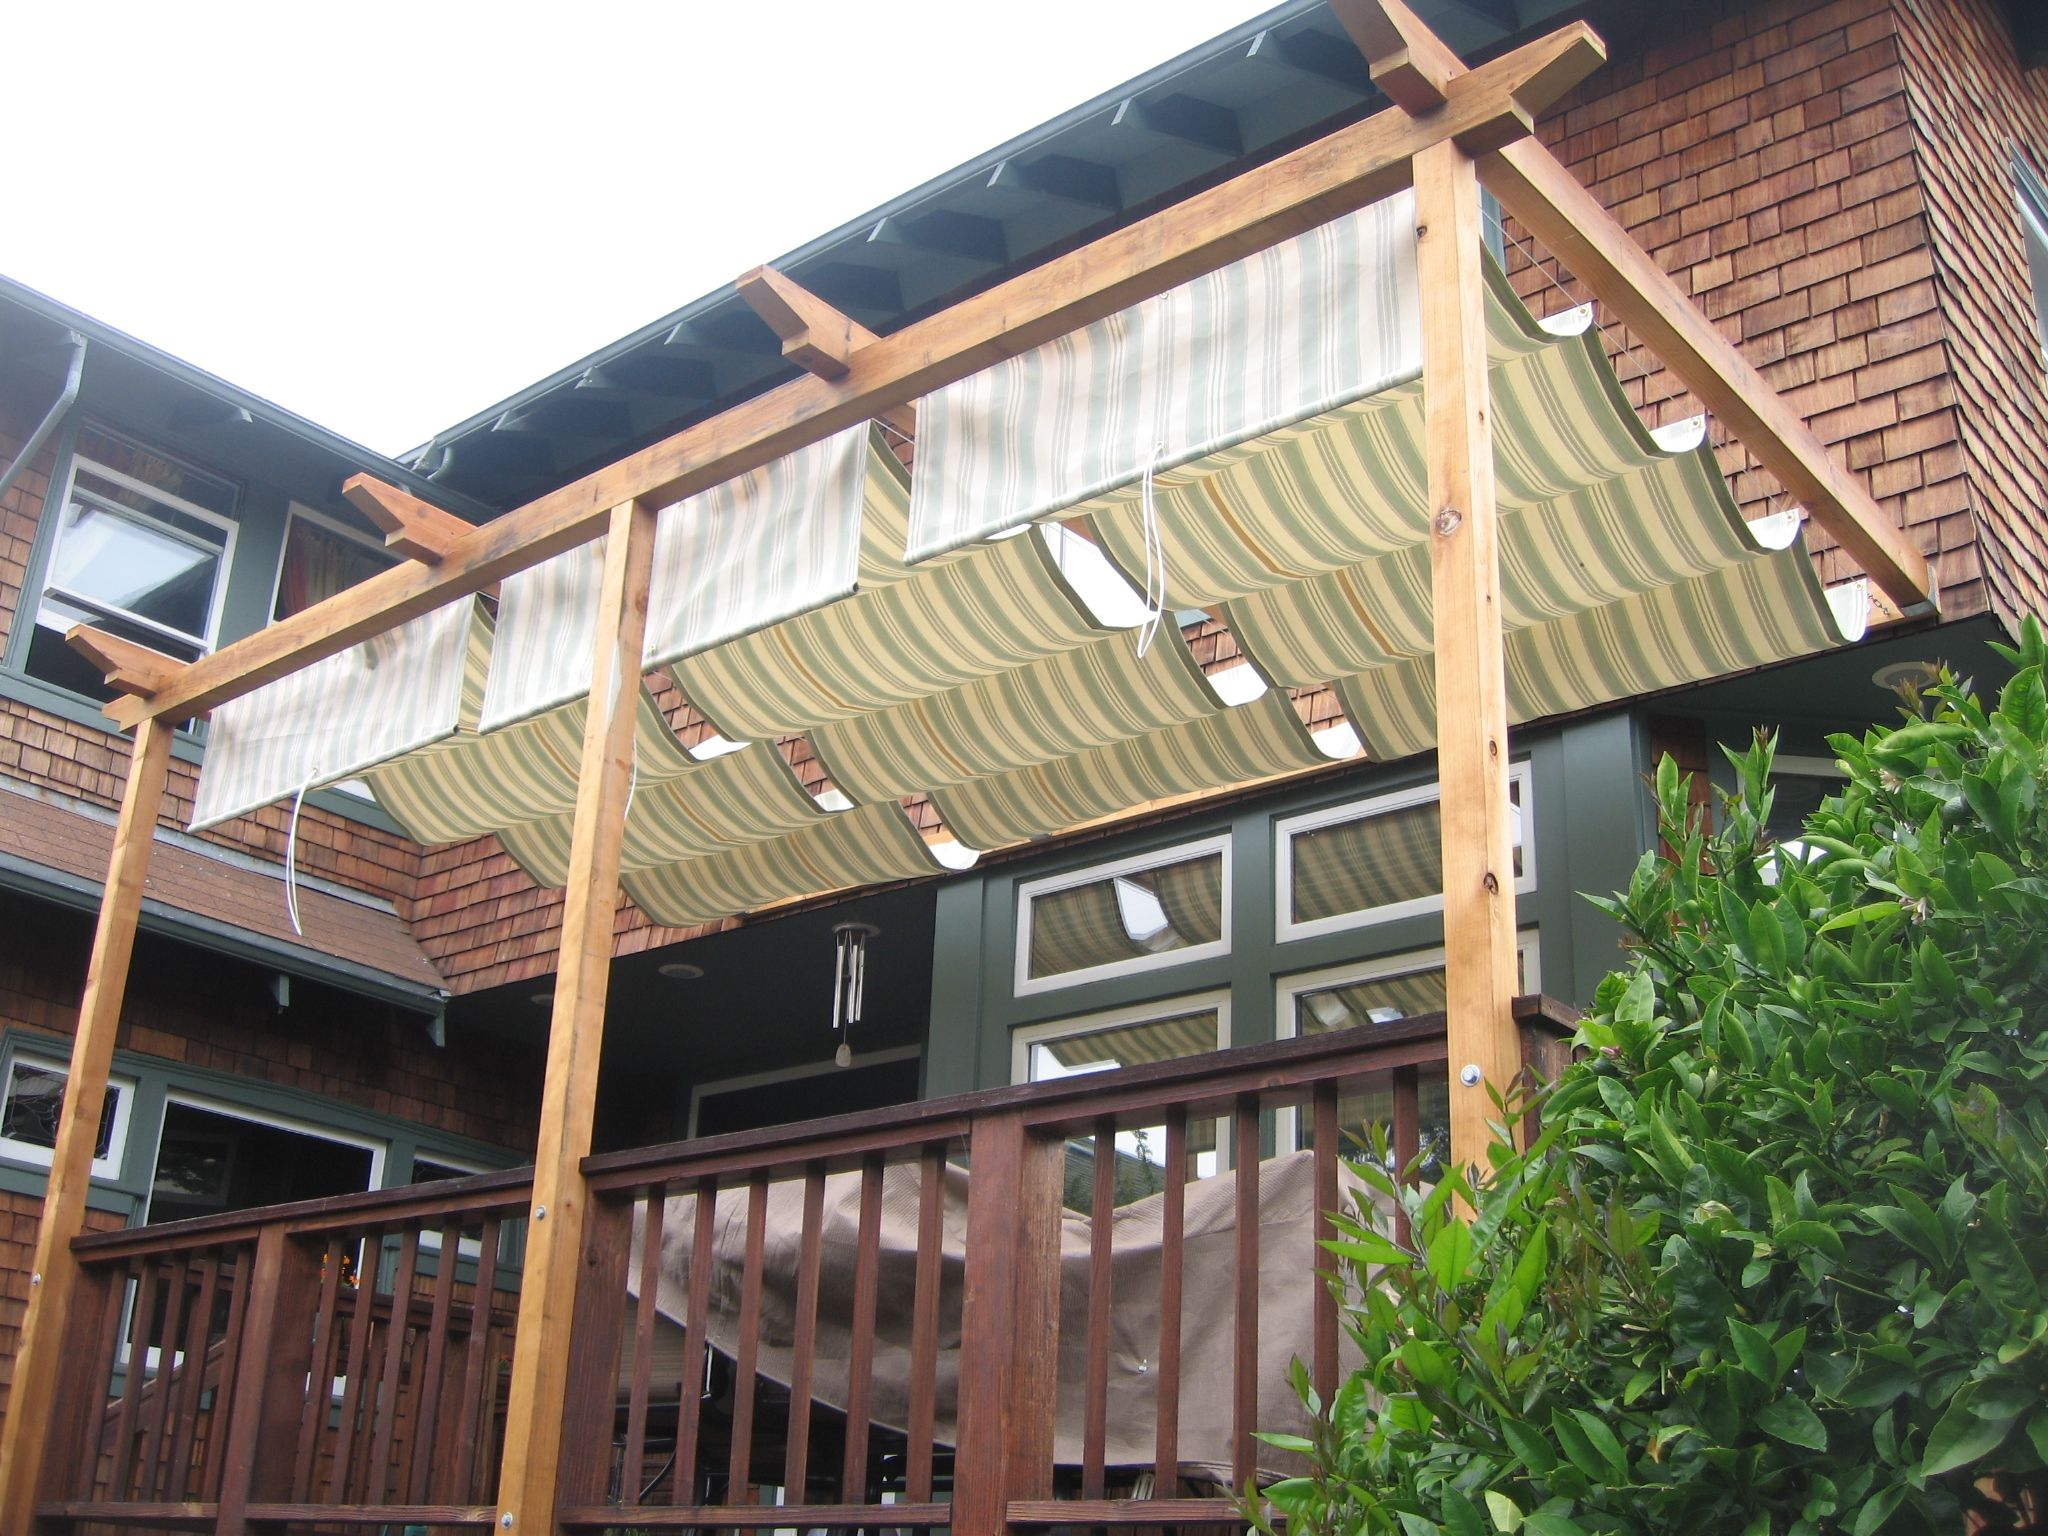 Retractable Home Made Sunshade Backyard Shade Patio Sun Shades